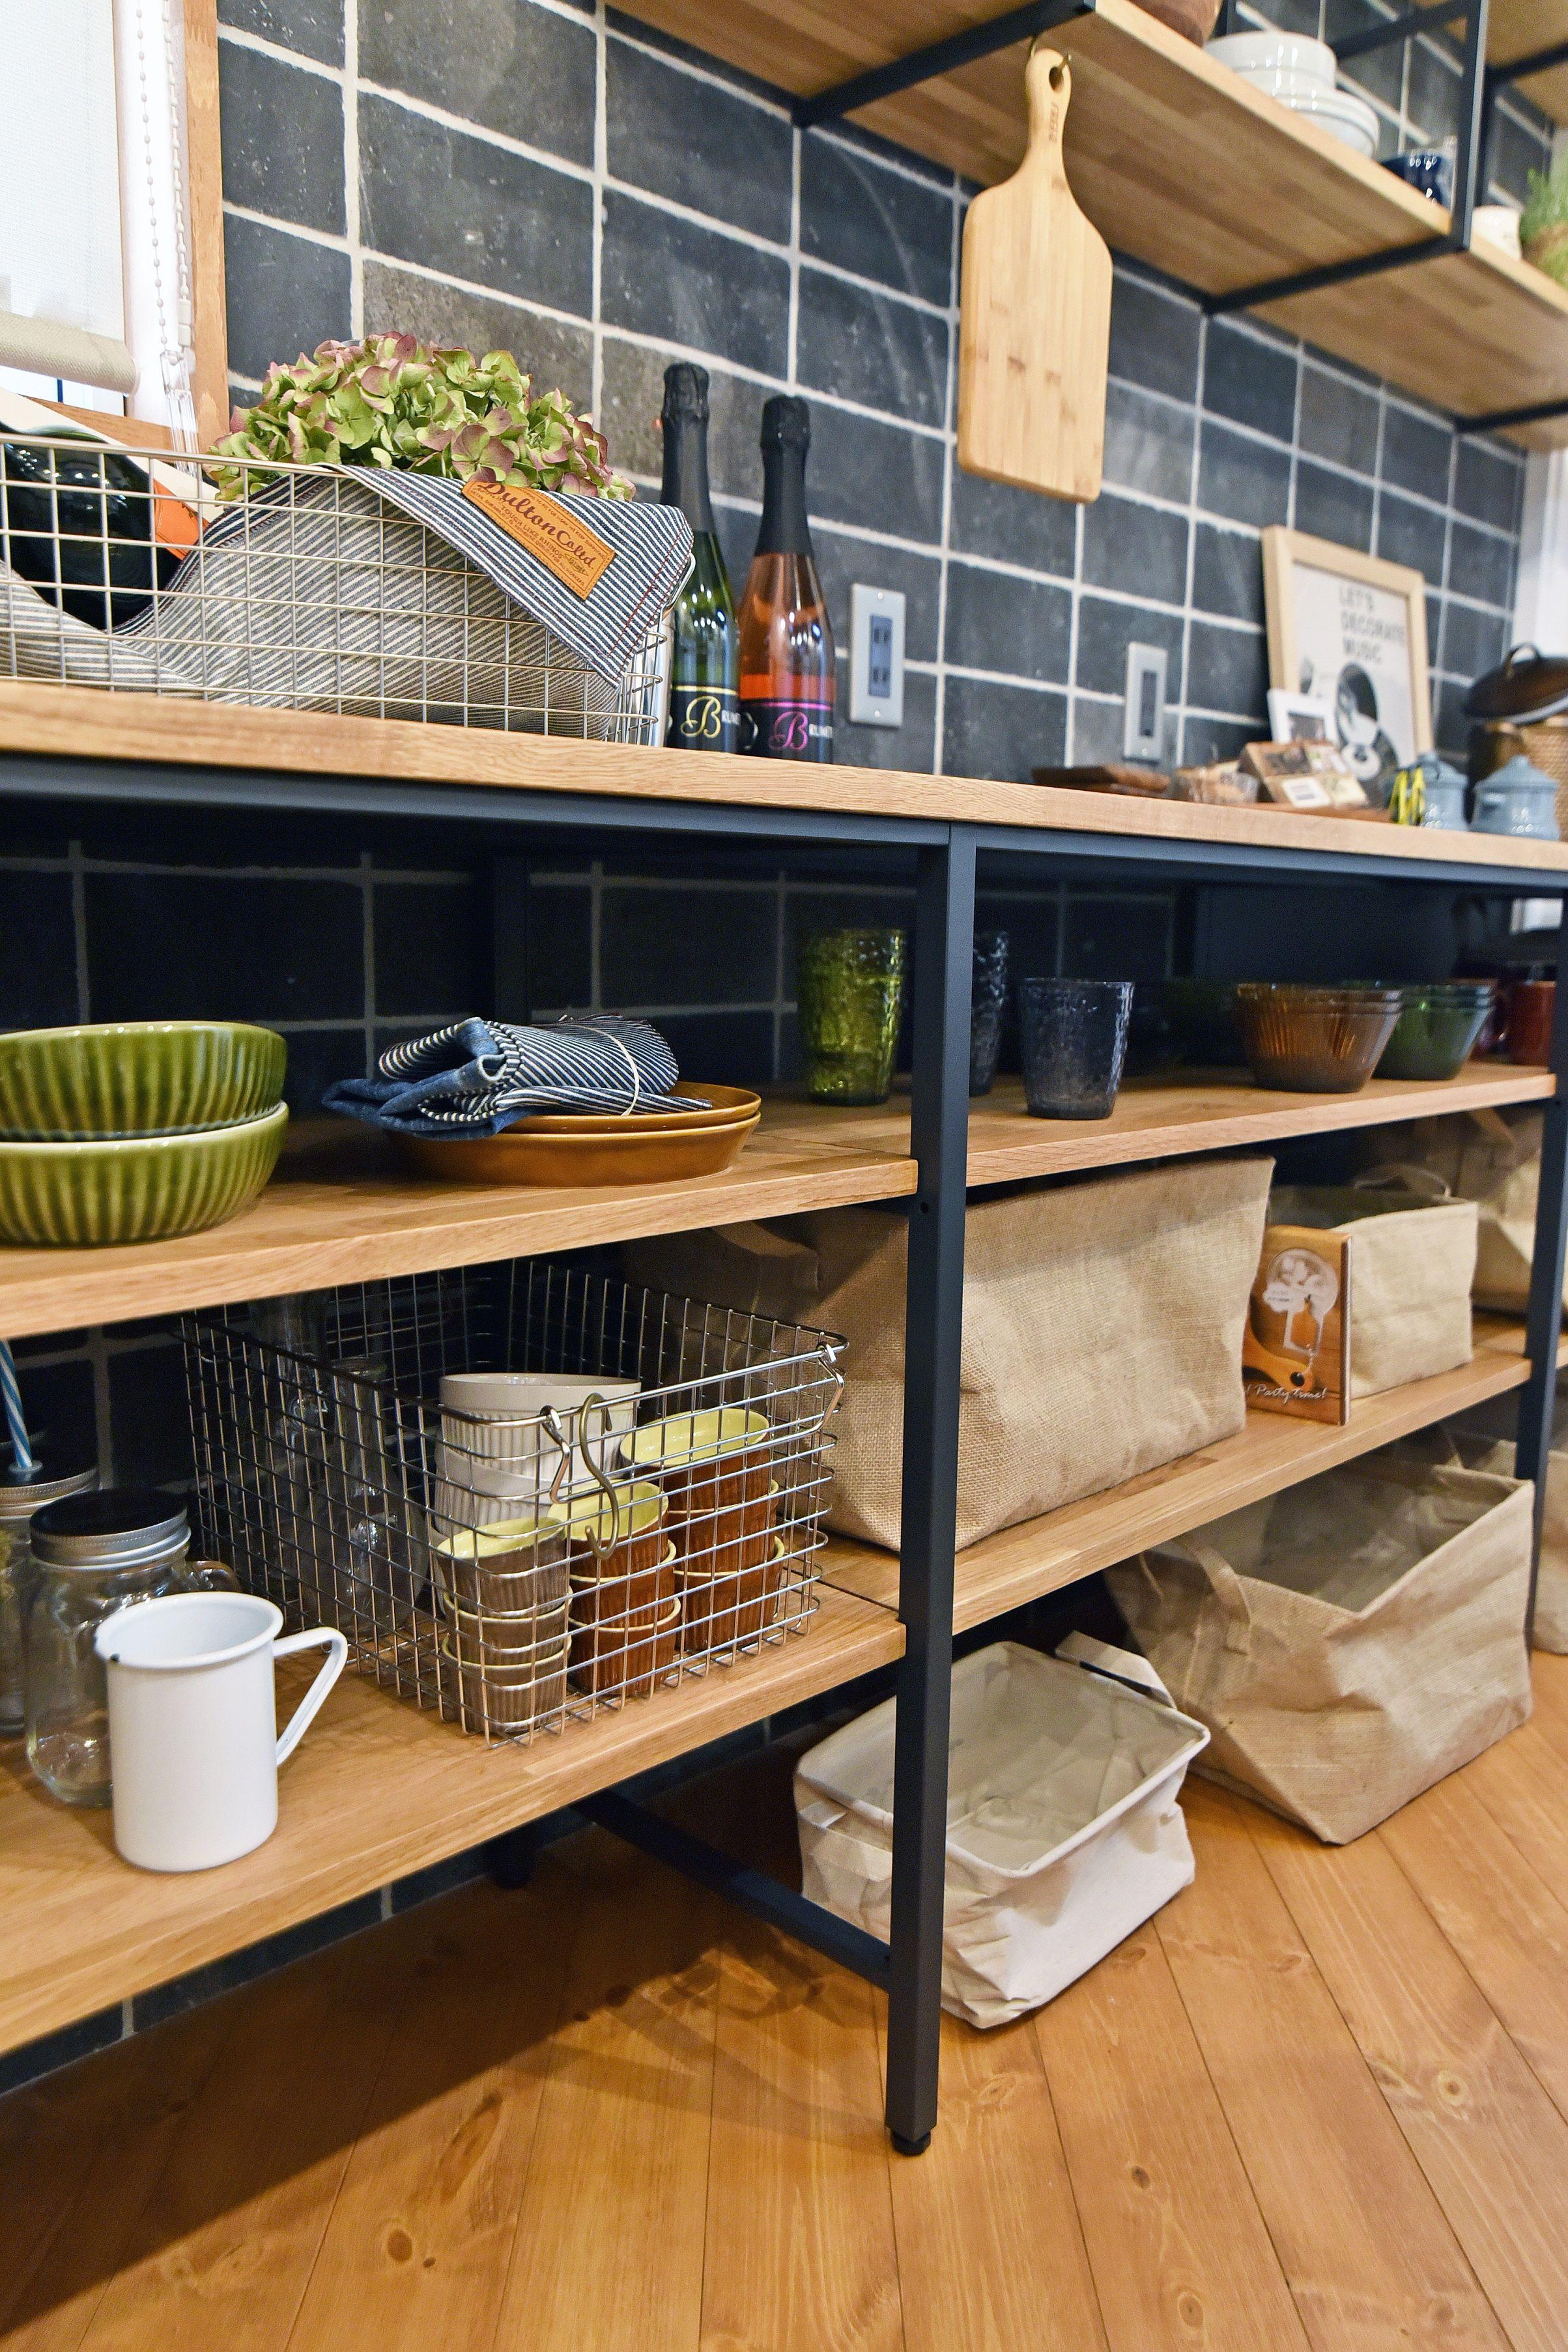 Wood One キッチンバック 見せる収納 施工事例 キッチンアイデア